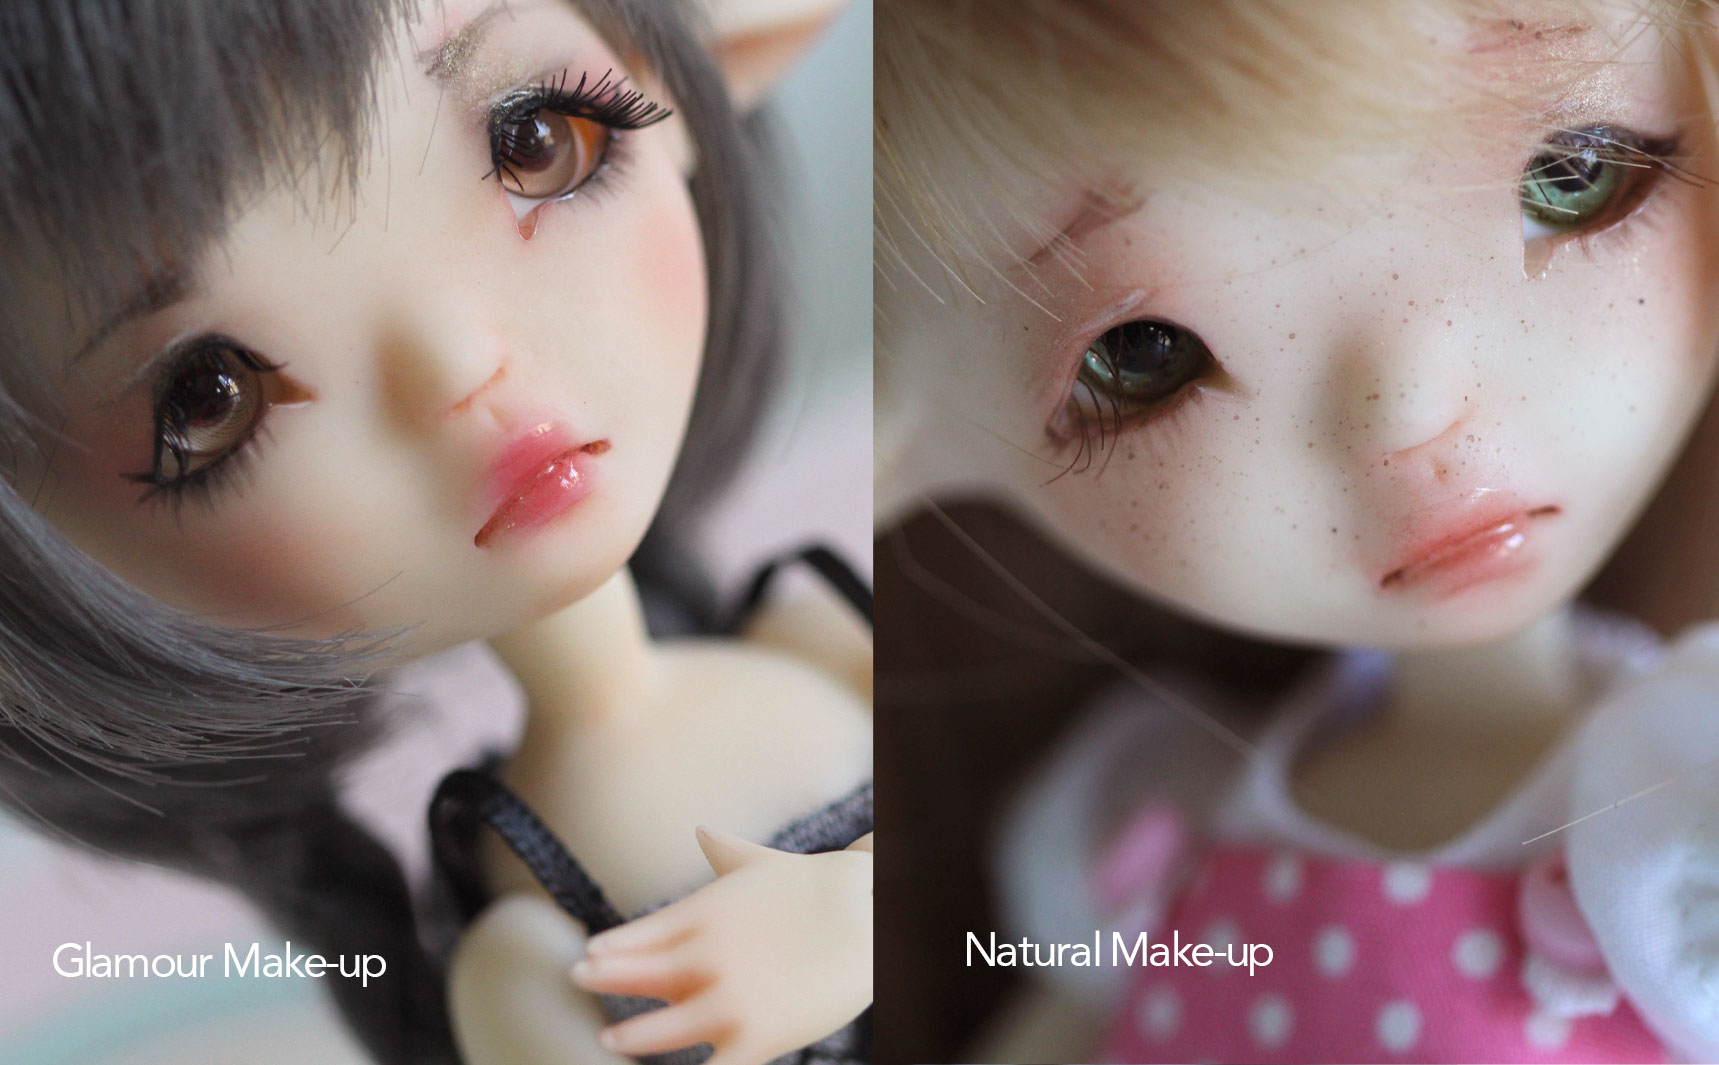 [NYMPHEAS DOLLS] Tit'herbe & Tit'Fleur Snow P35 - Page 5 Malicie-cream-nympheas-dolls-0451